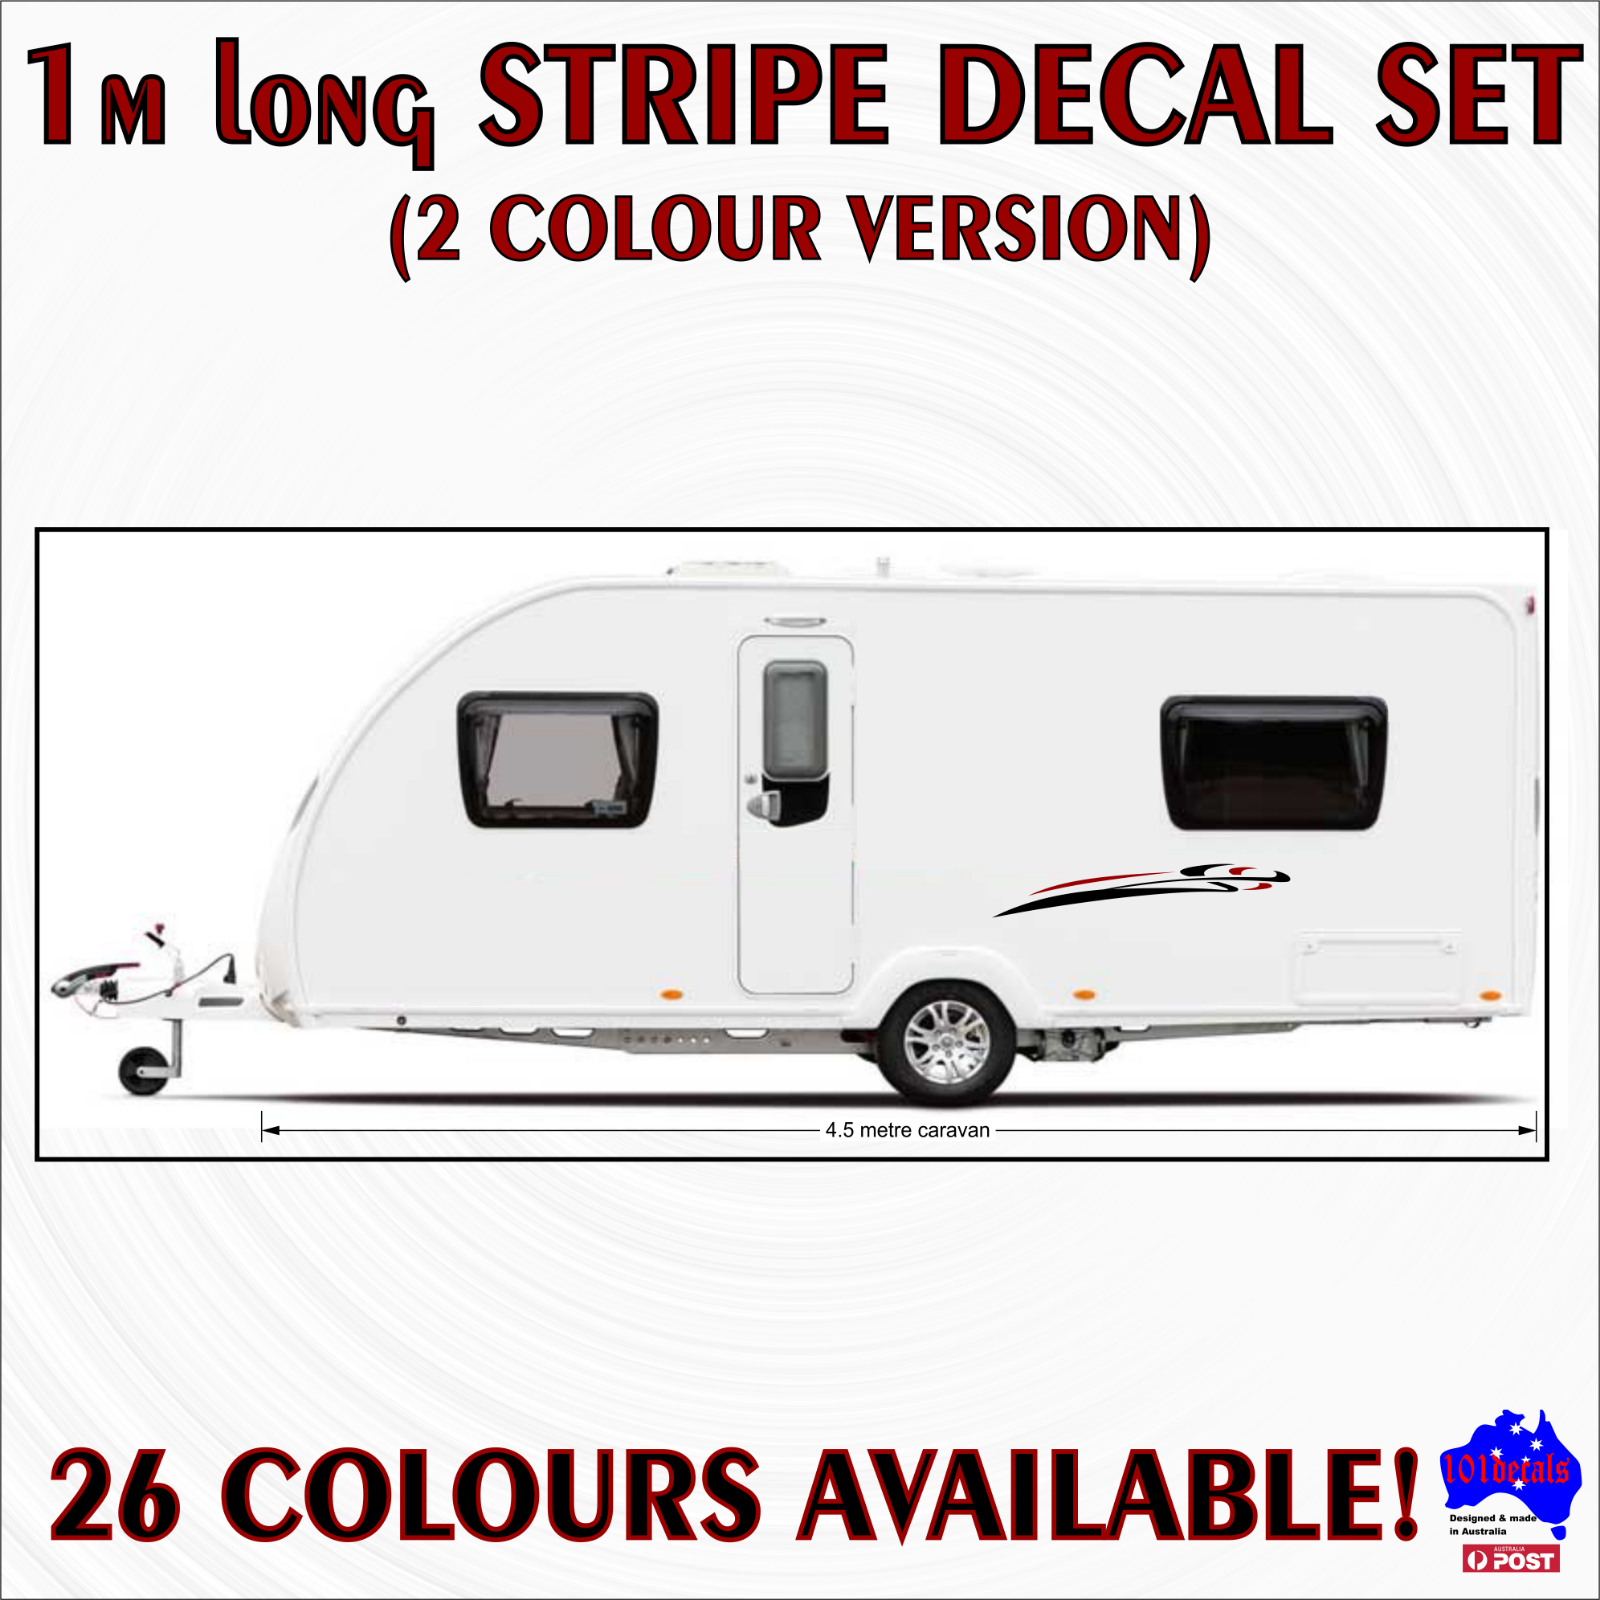 59cm STRIPE #6 decal sticker set!Car,caravan,4wd,boat,tinny marine vinyl graphic